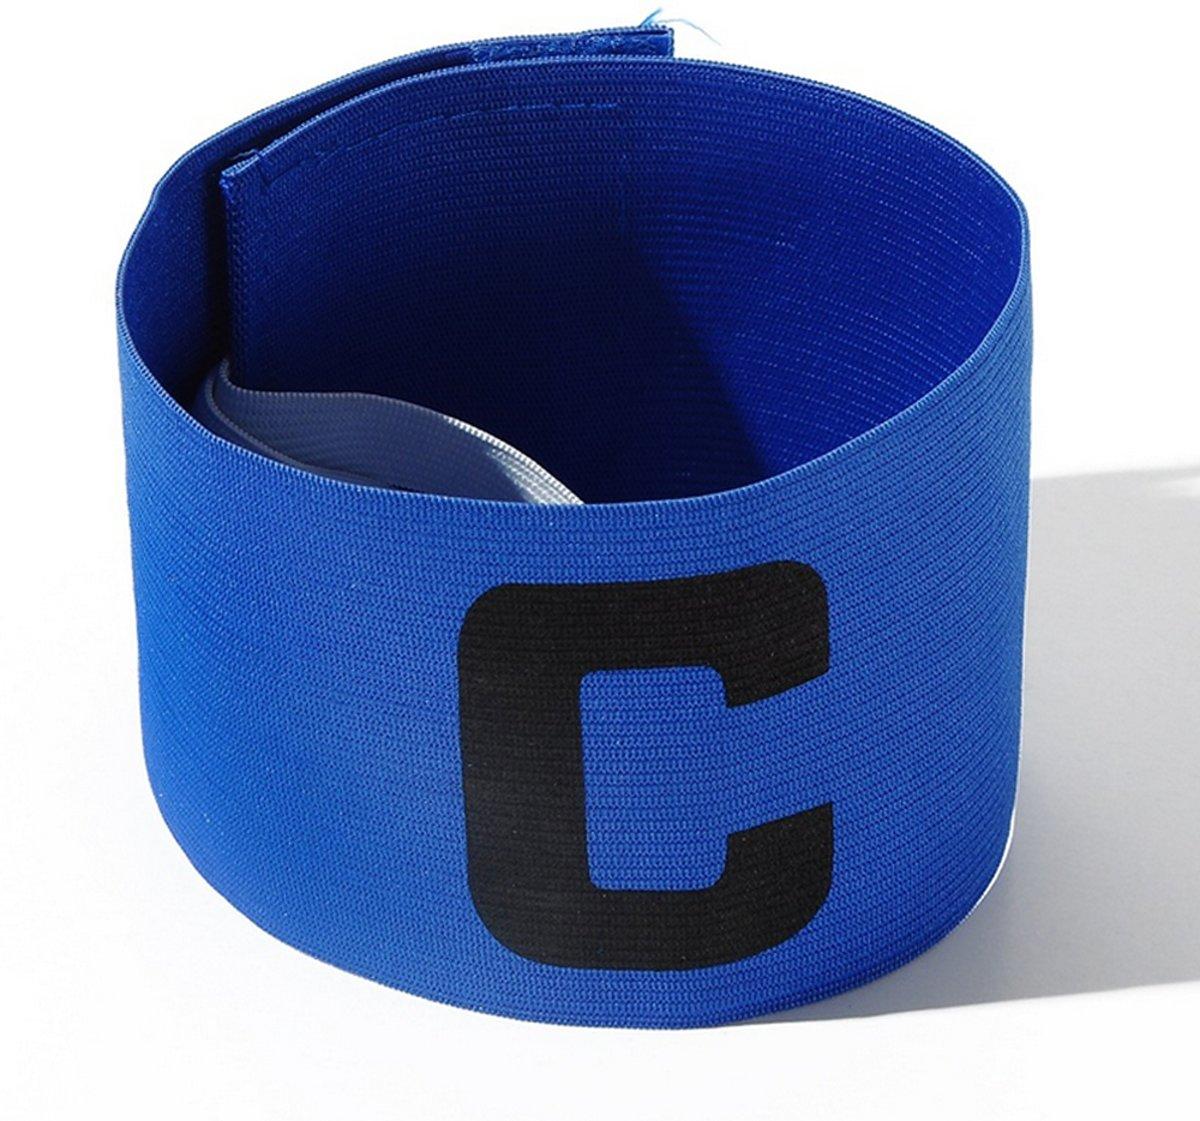 Aanvoerdersband Captainsband - C - Captain Aanvoerder Band - Voetbal Hockey - Blauw - Senior